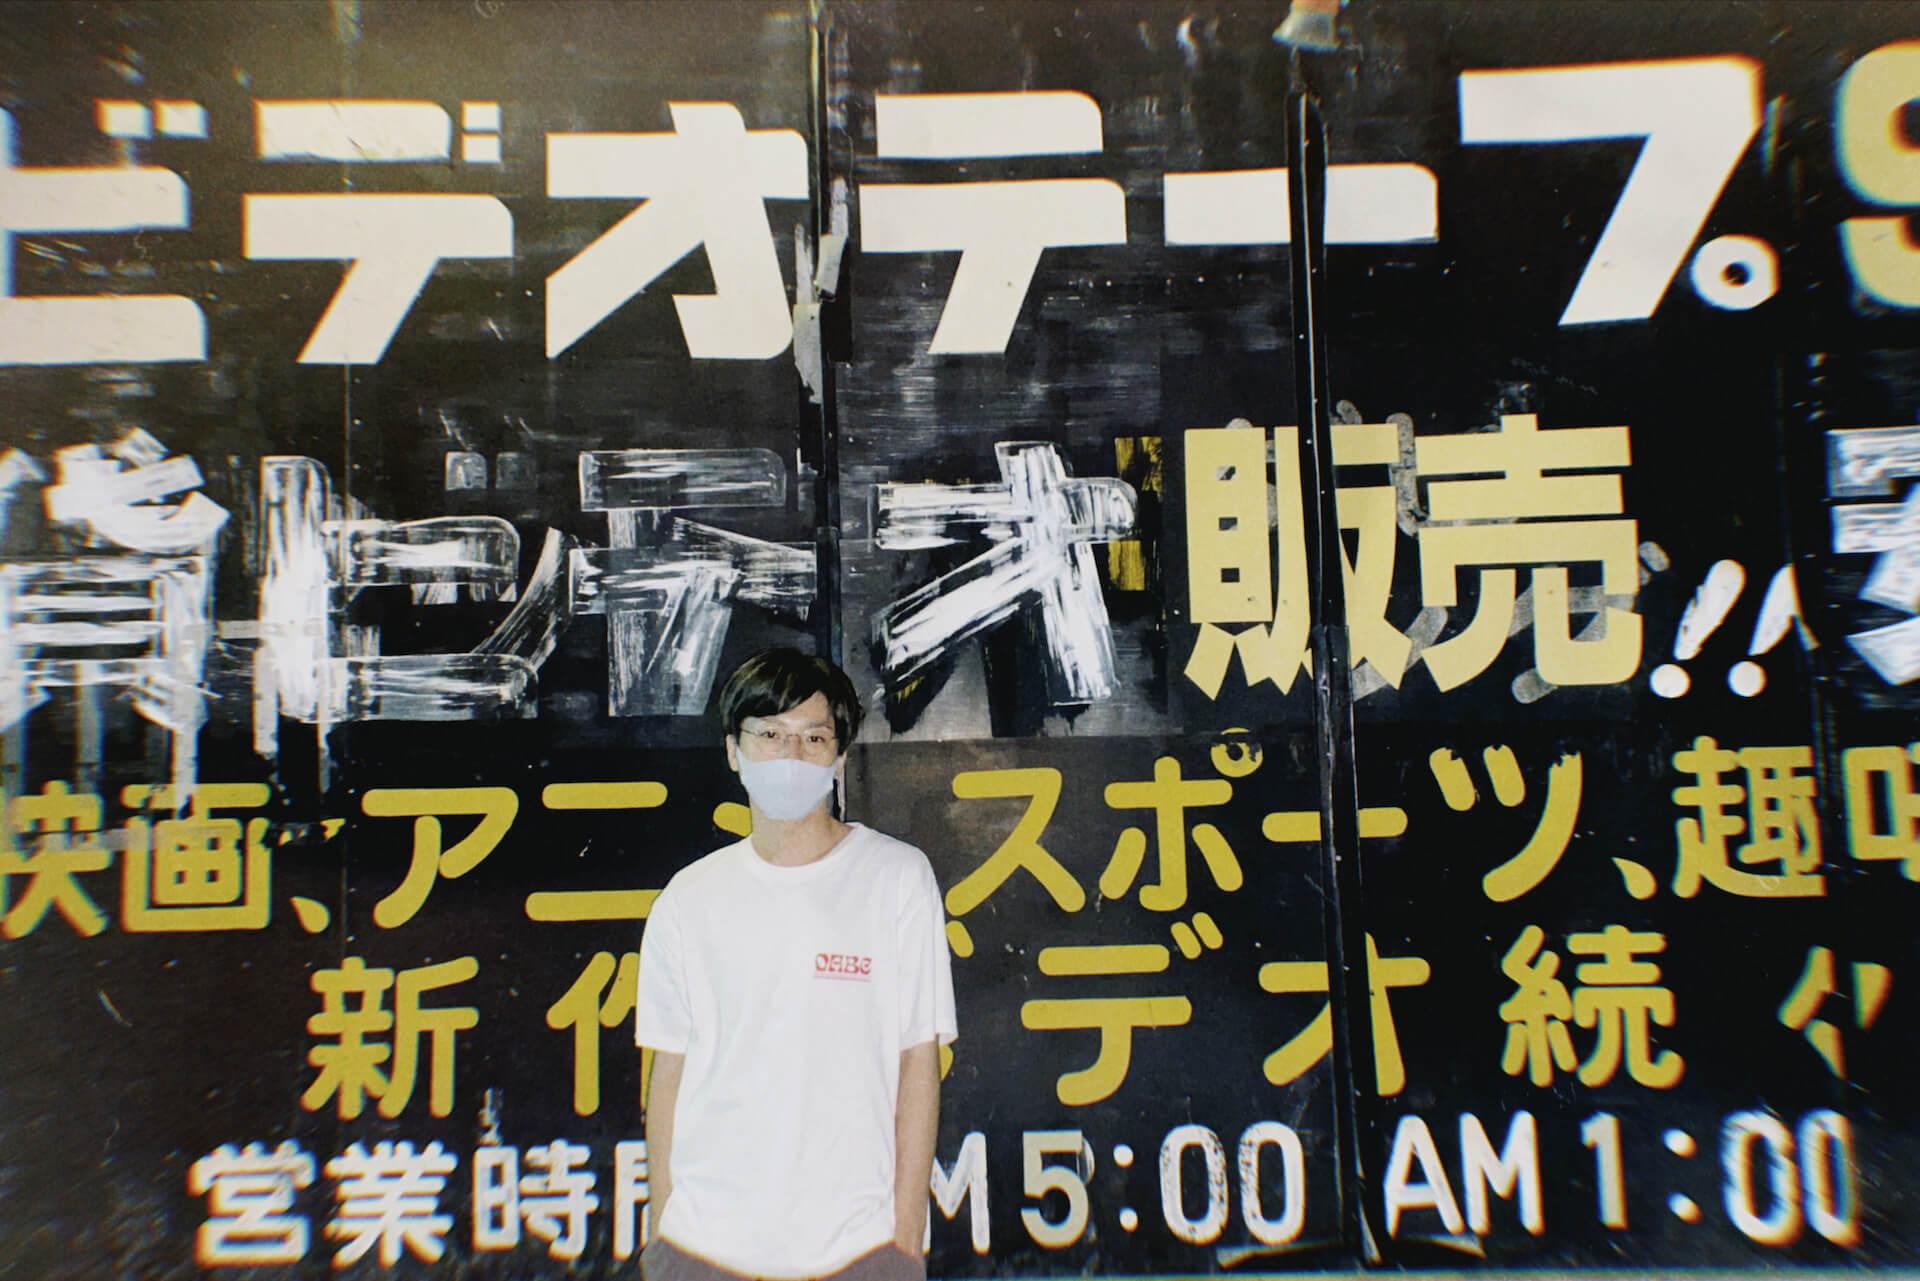 VIDEOTAPEMUSIC、〈BLACK SMOKER〉よりMIX CD『Hello Stranger』を4月20日にリリース msuci210409-videotapemusic-2